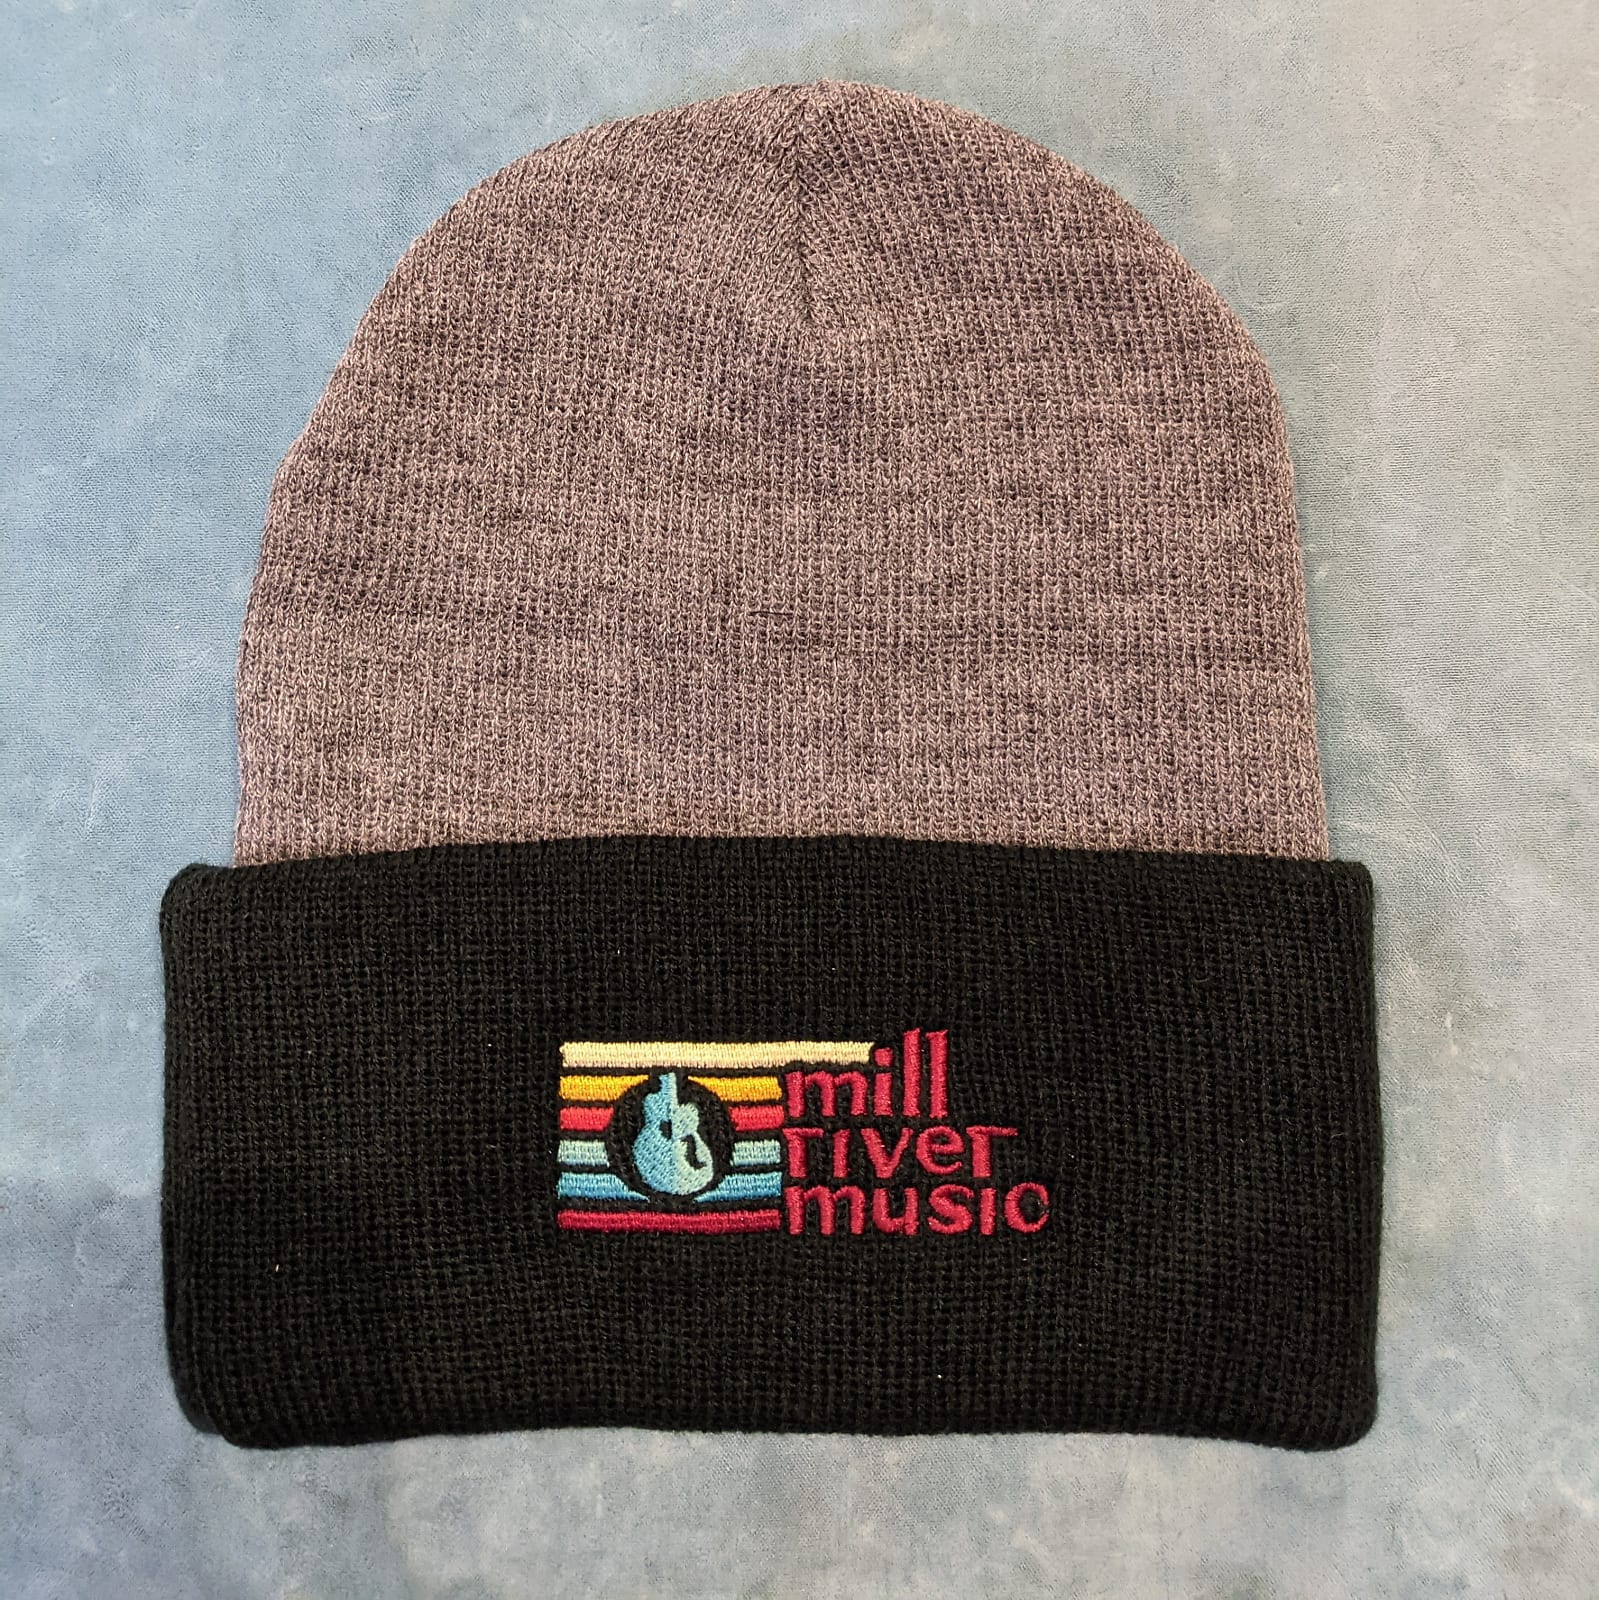 Mill River Music Embroidered Cuff Beanie 1st Ed Main Logo Ath Heather & Black